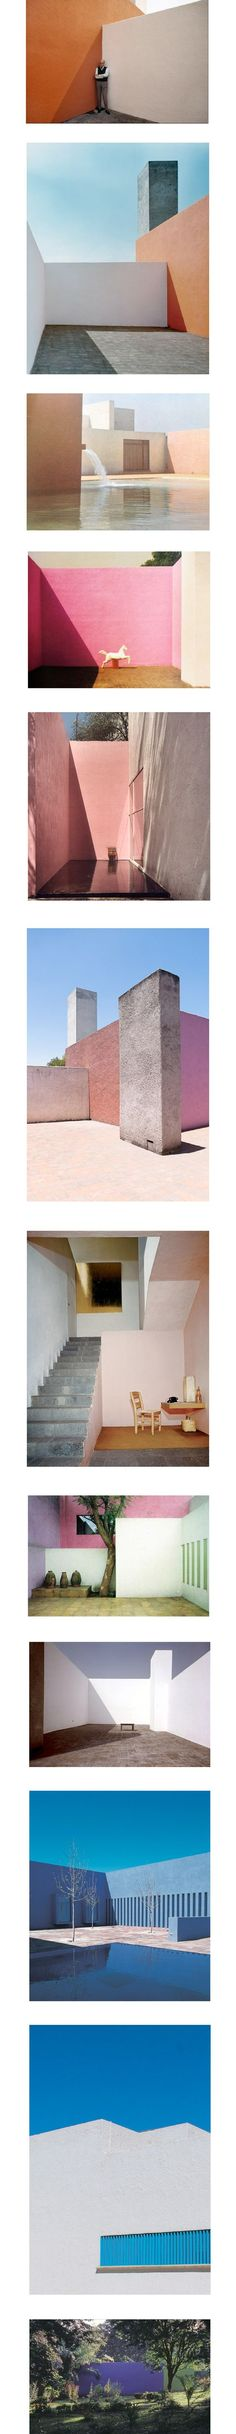 Luis Barragan, architecte mexicain (1902-1988) like Alice in Wonderland !: